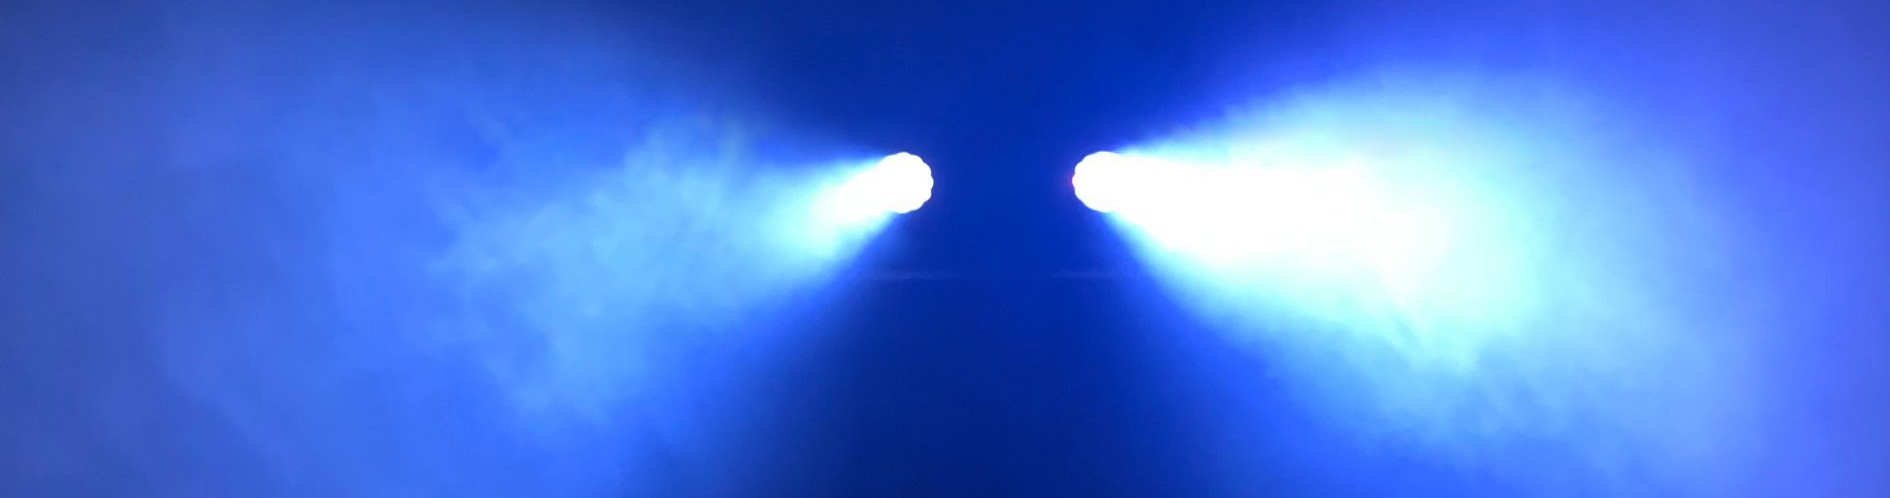 PLS-PRO light